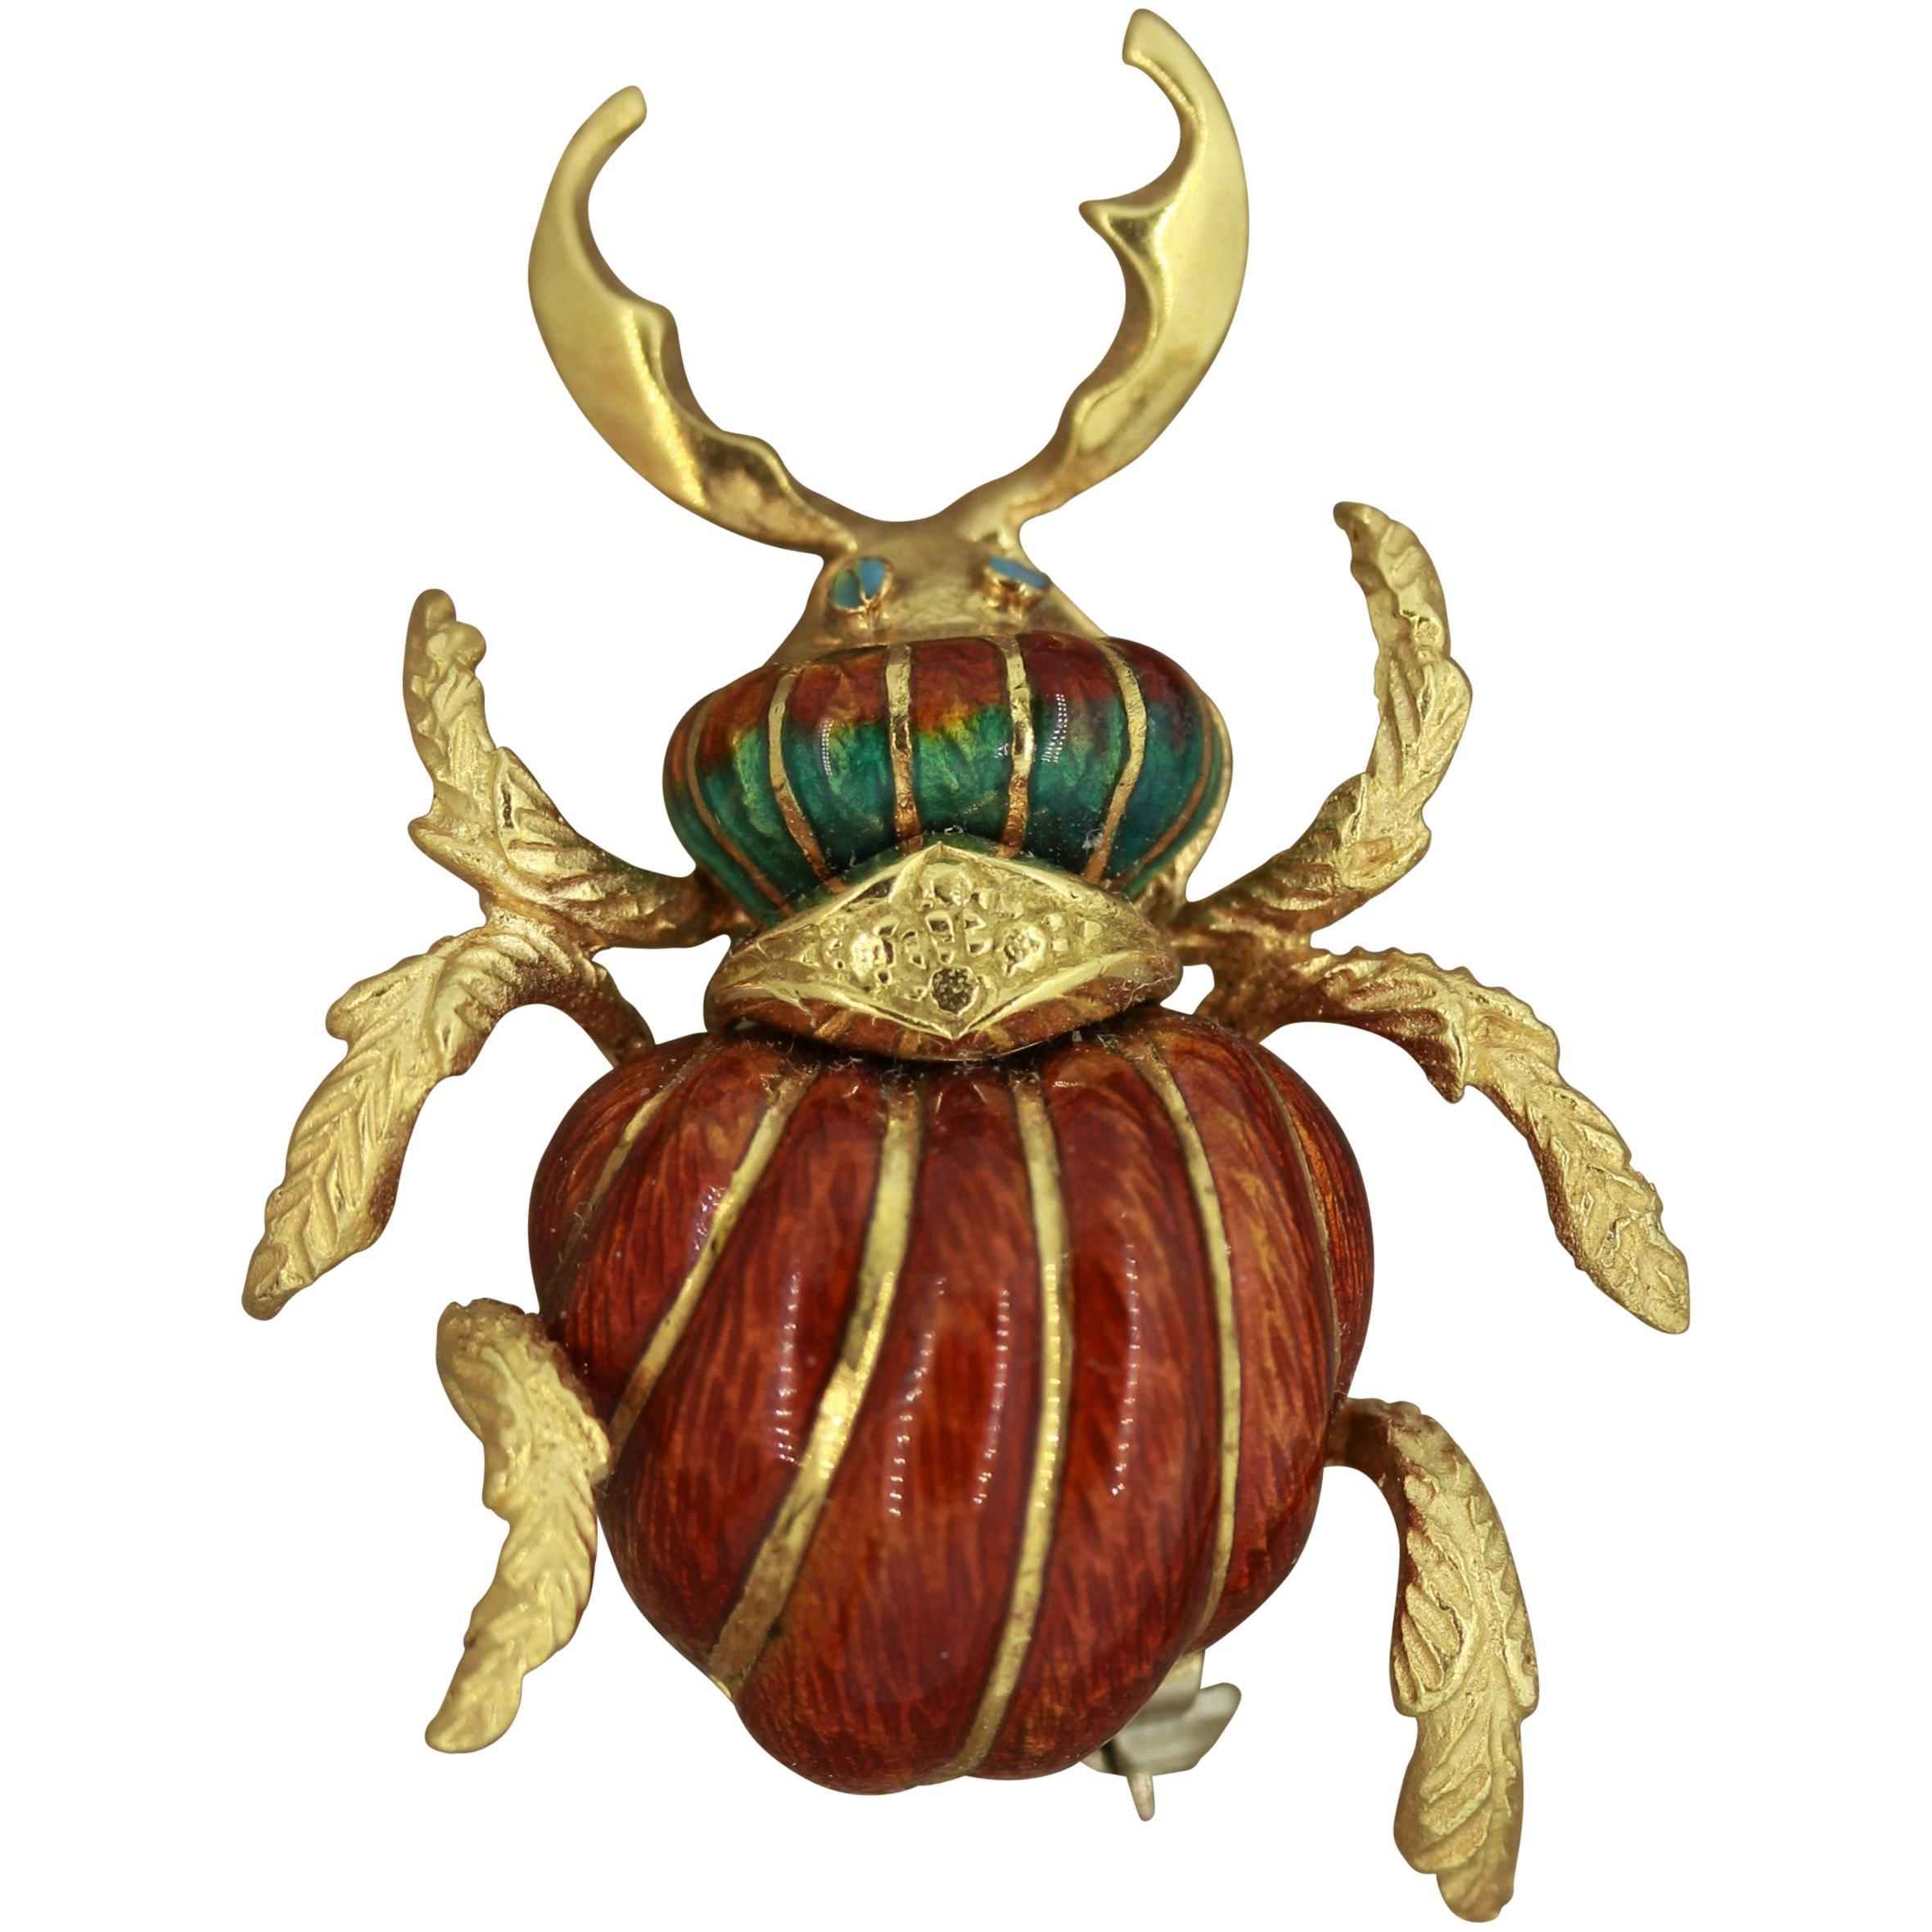 Midcentury Italian Enameled Gold Horned-Beetle Pin Brooch